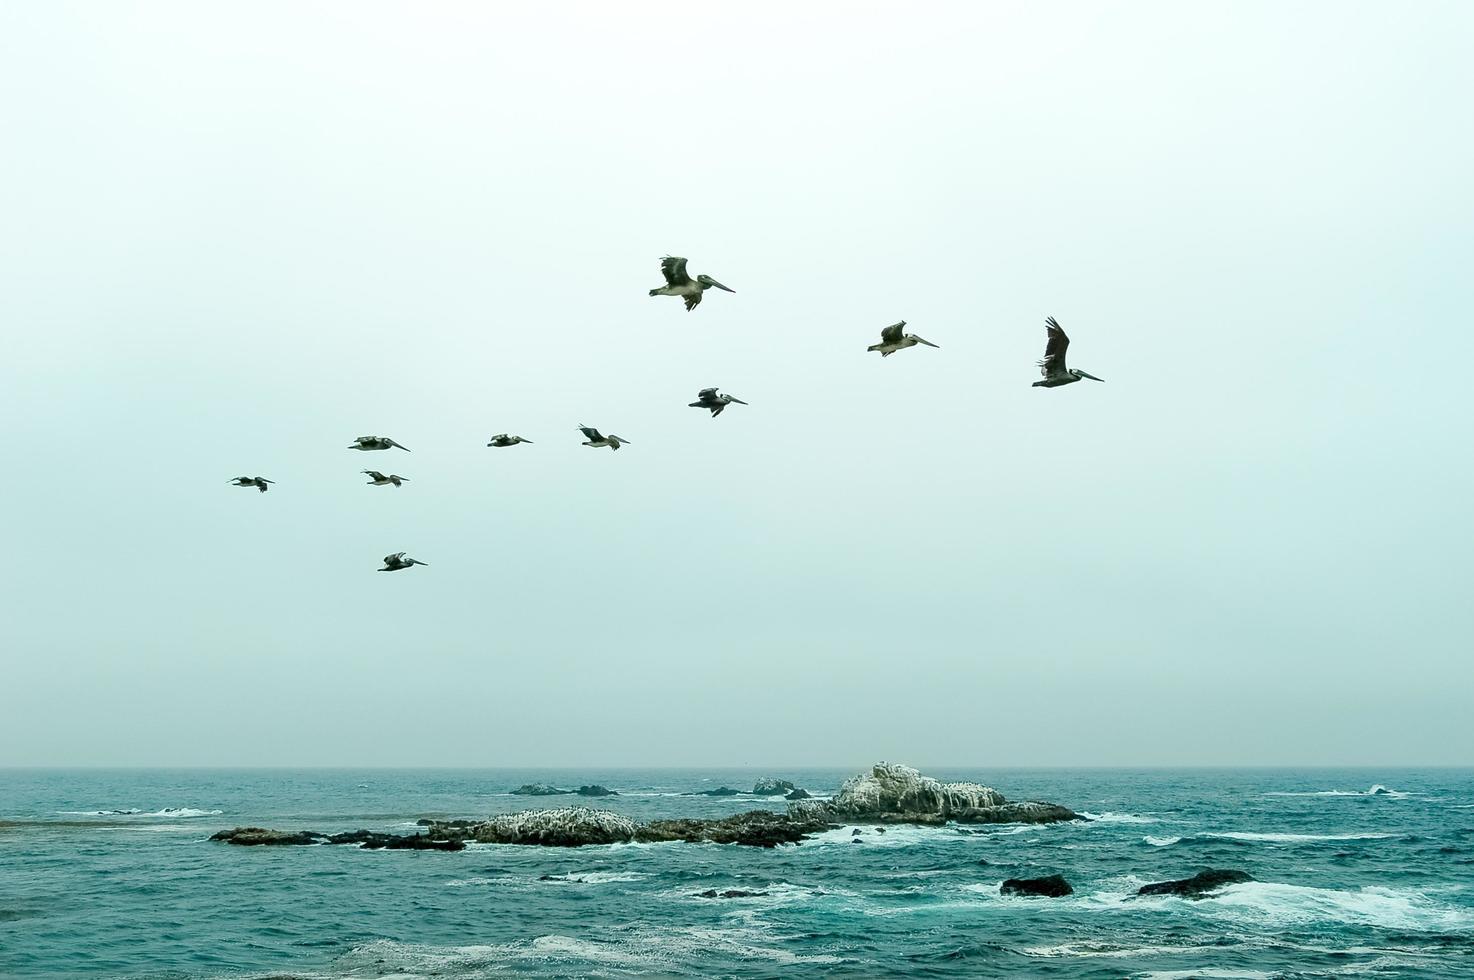 pellicani sull'oceano foto